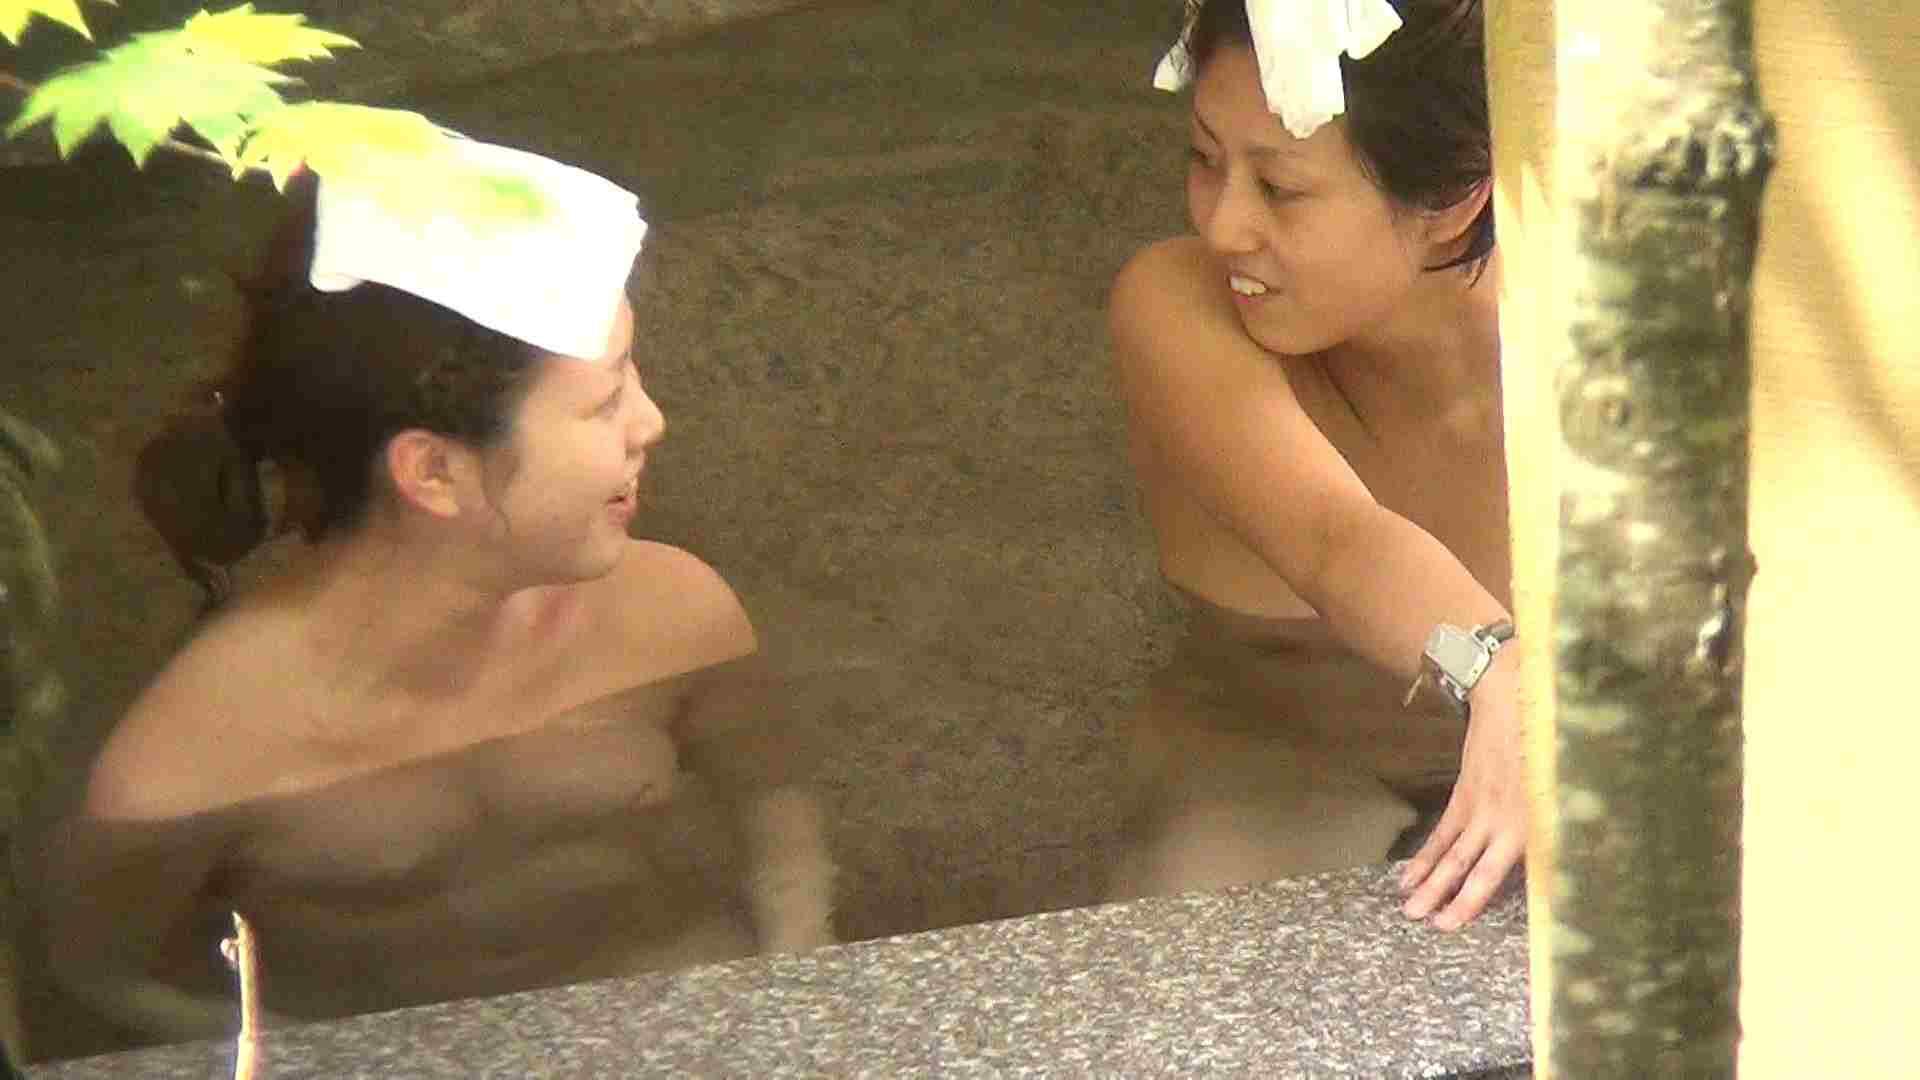 Aquaな露天風呂Vol.243 OLのエロ生活   露天風呂  57連発 43